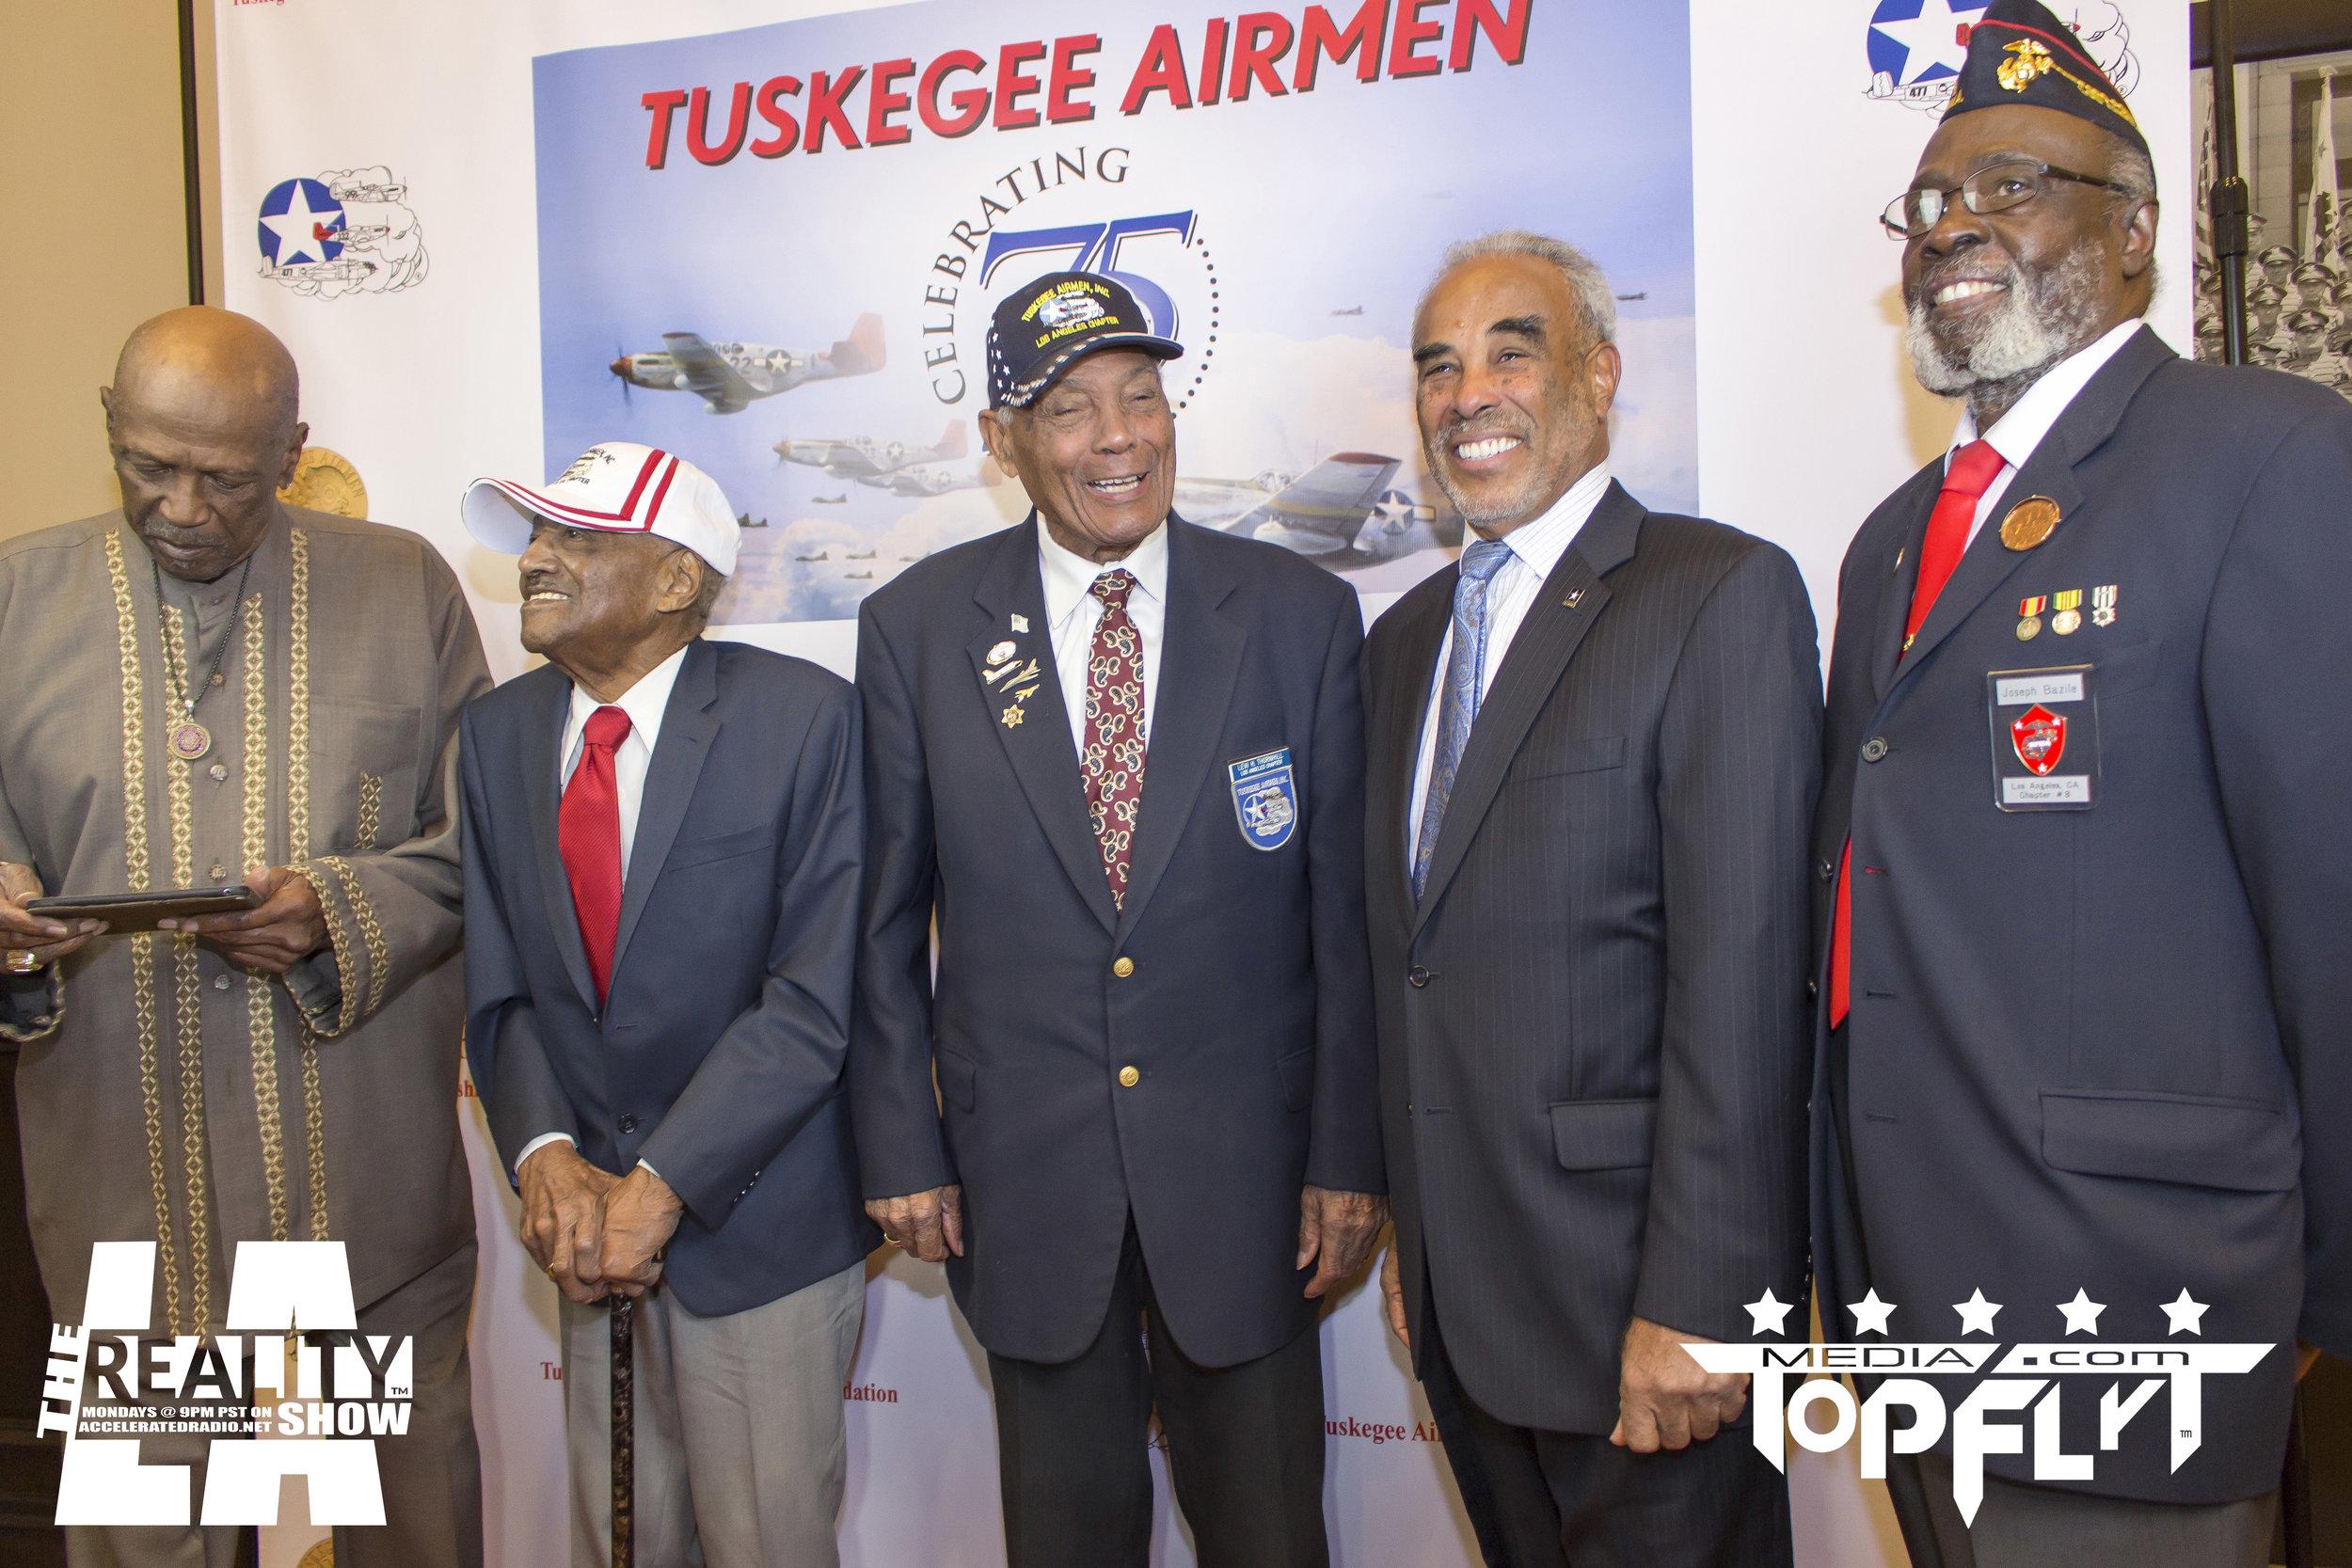 The Reality Show LA - Tuskegee Airmen 75th Anniversary VIP Reception_26.jpg